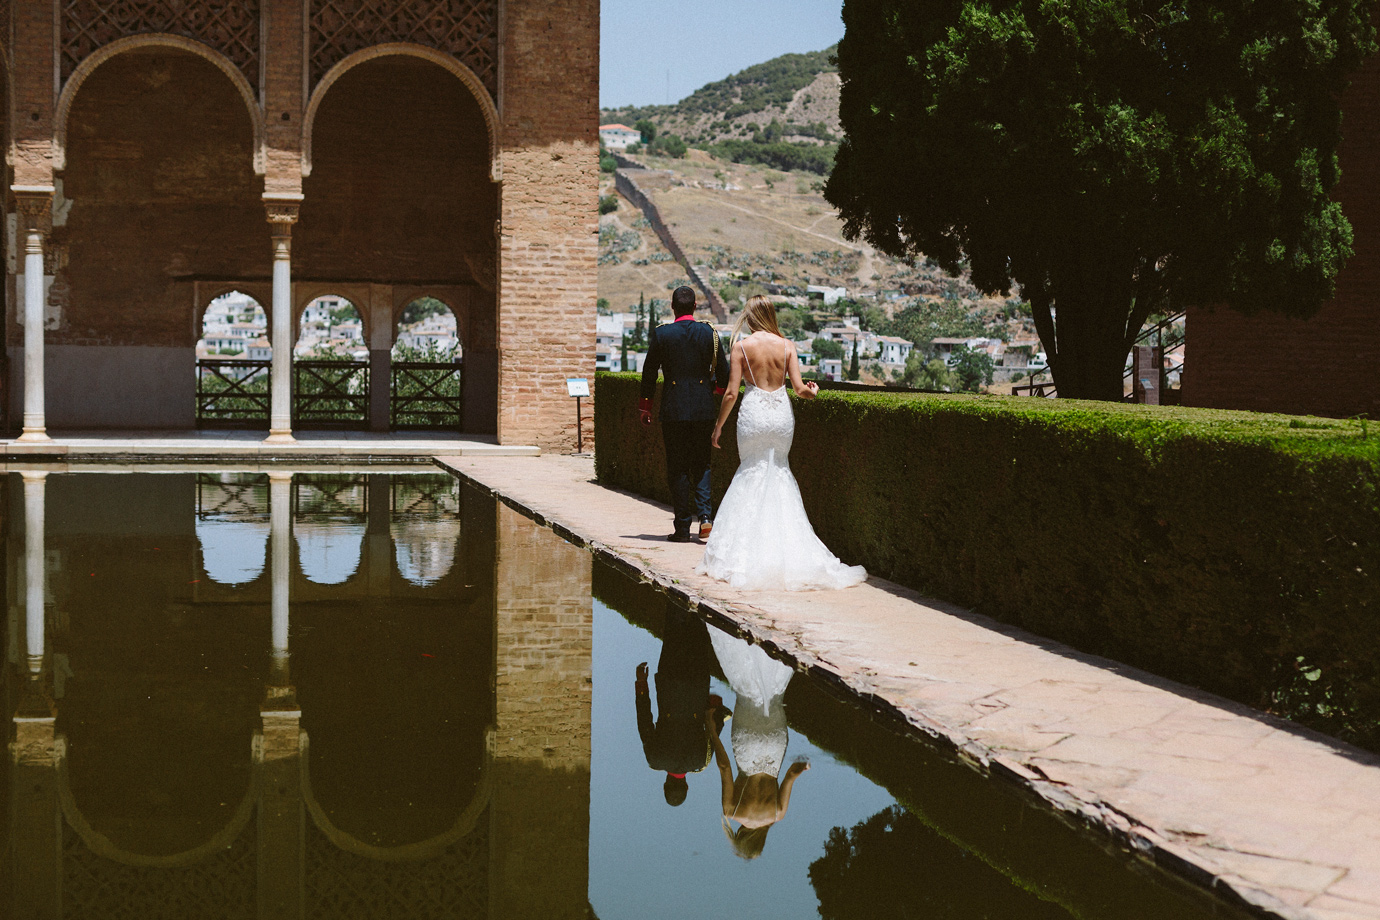 fotografo de bodas en malaga archidona granada madrid alhambra princesa